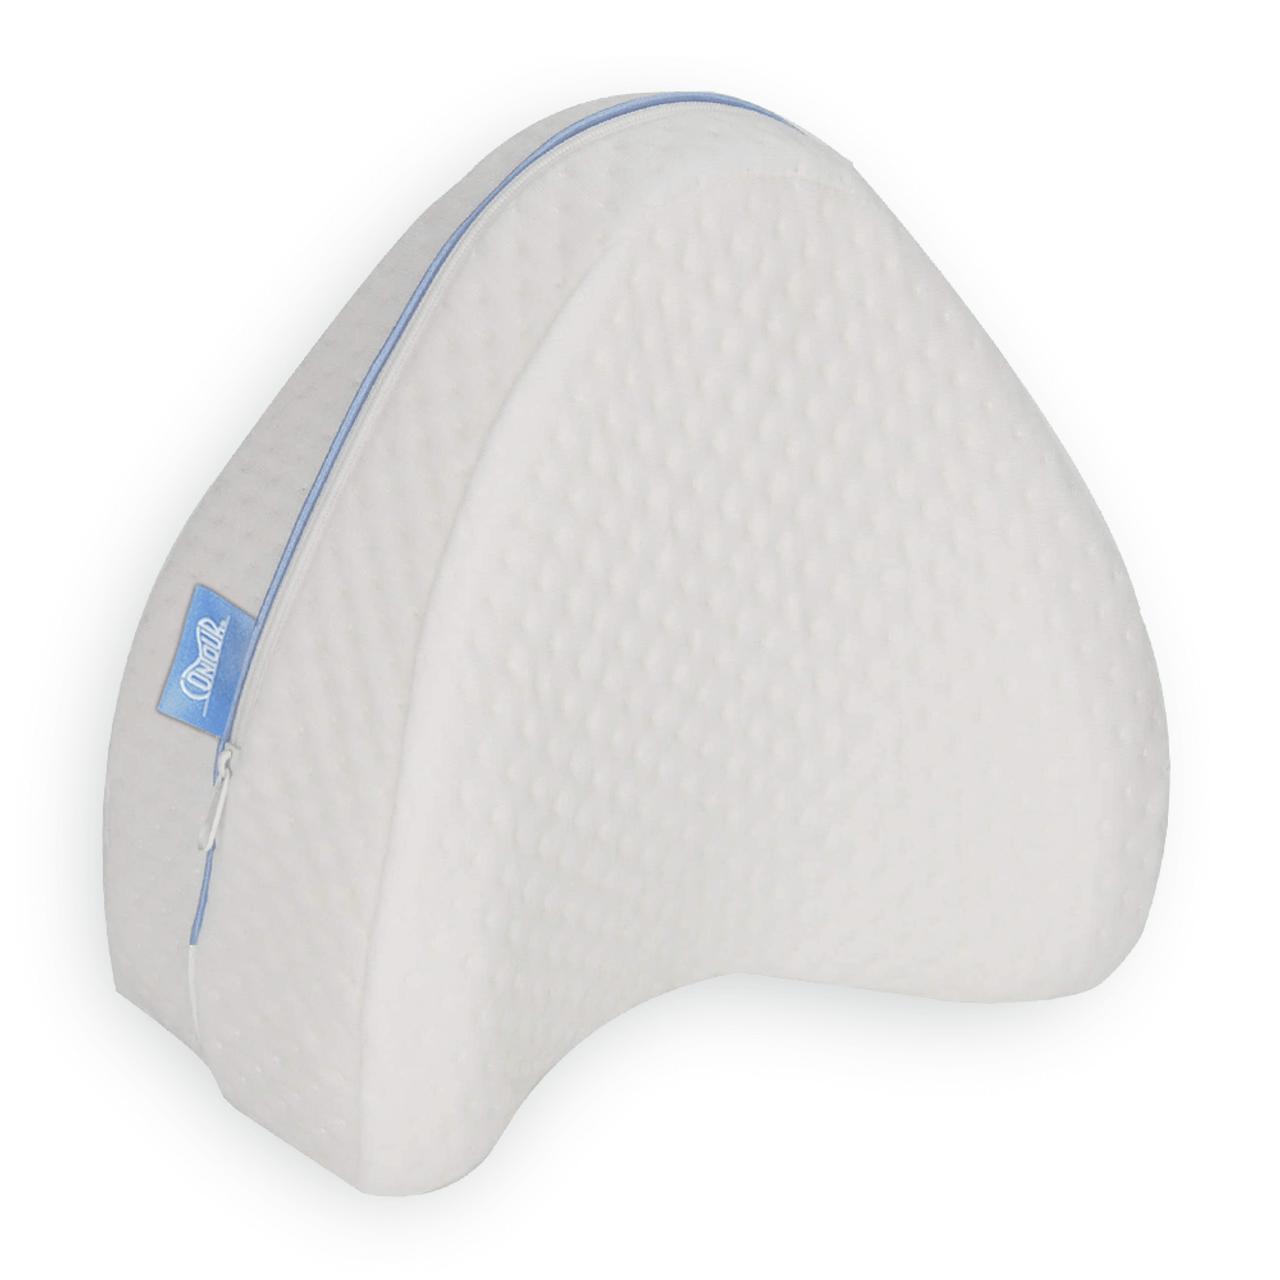 Comfy Leg Pillow Cotton Leg Pelvic Sleeping Orthopedic Back Hip Joint Pain Foam